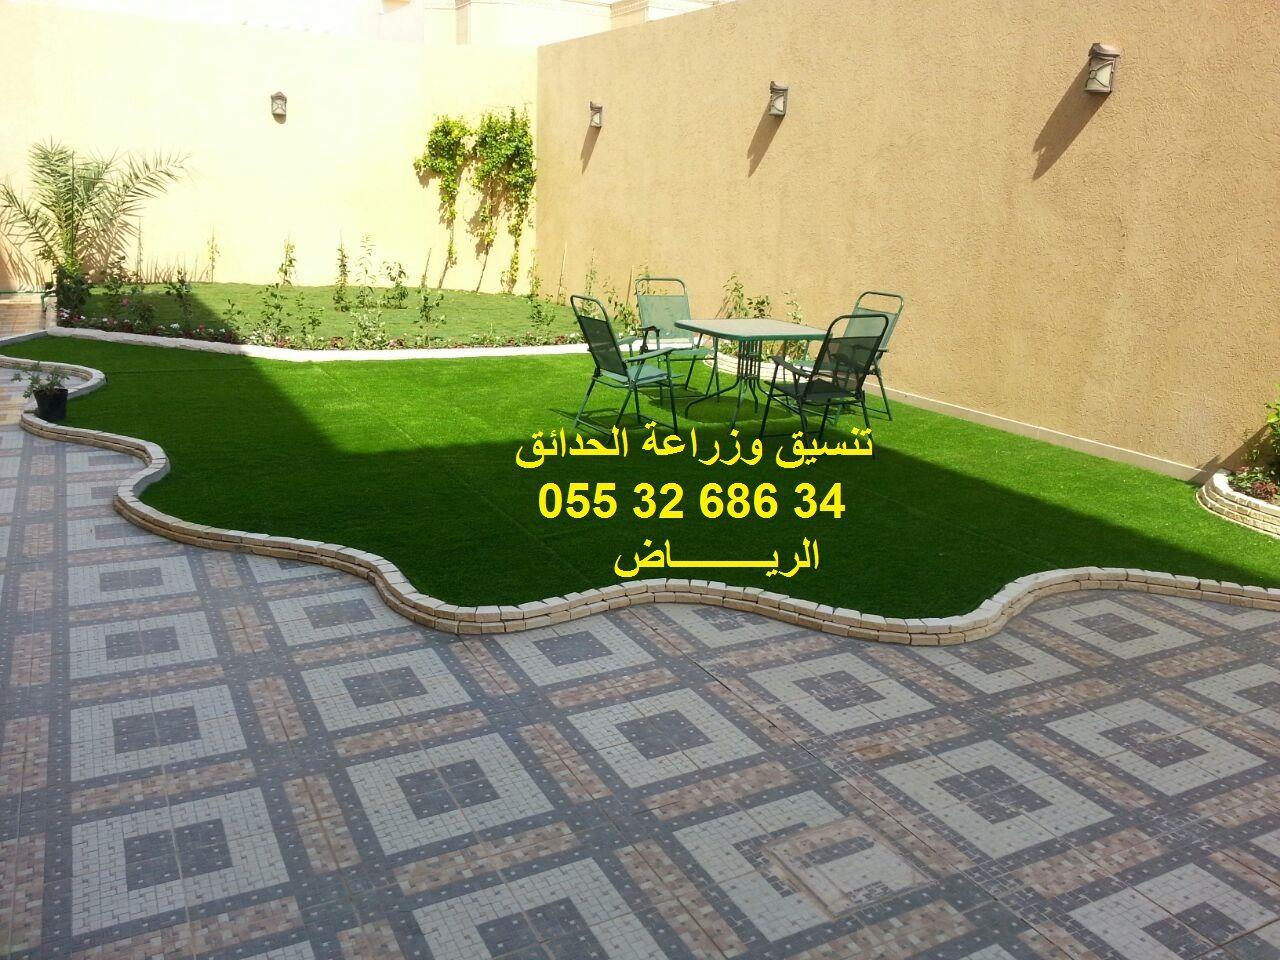 تصميم حدائق ومنتزهات تصميم حدائق ومنتزهات الرياض تصميم حدائق ونافورات تصميم حديقة تصميم حديقة سطح تصميم حديقة سطح المنزل Diy Yard House Frame Bed Outdoor Decor